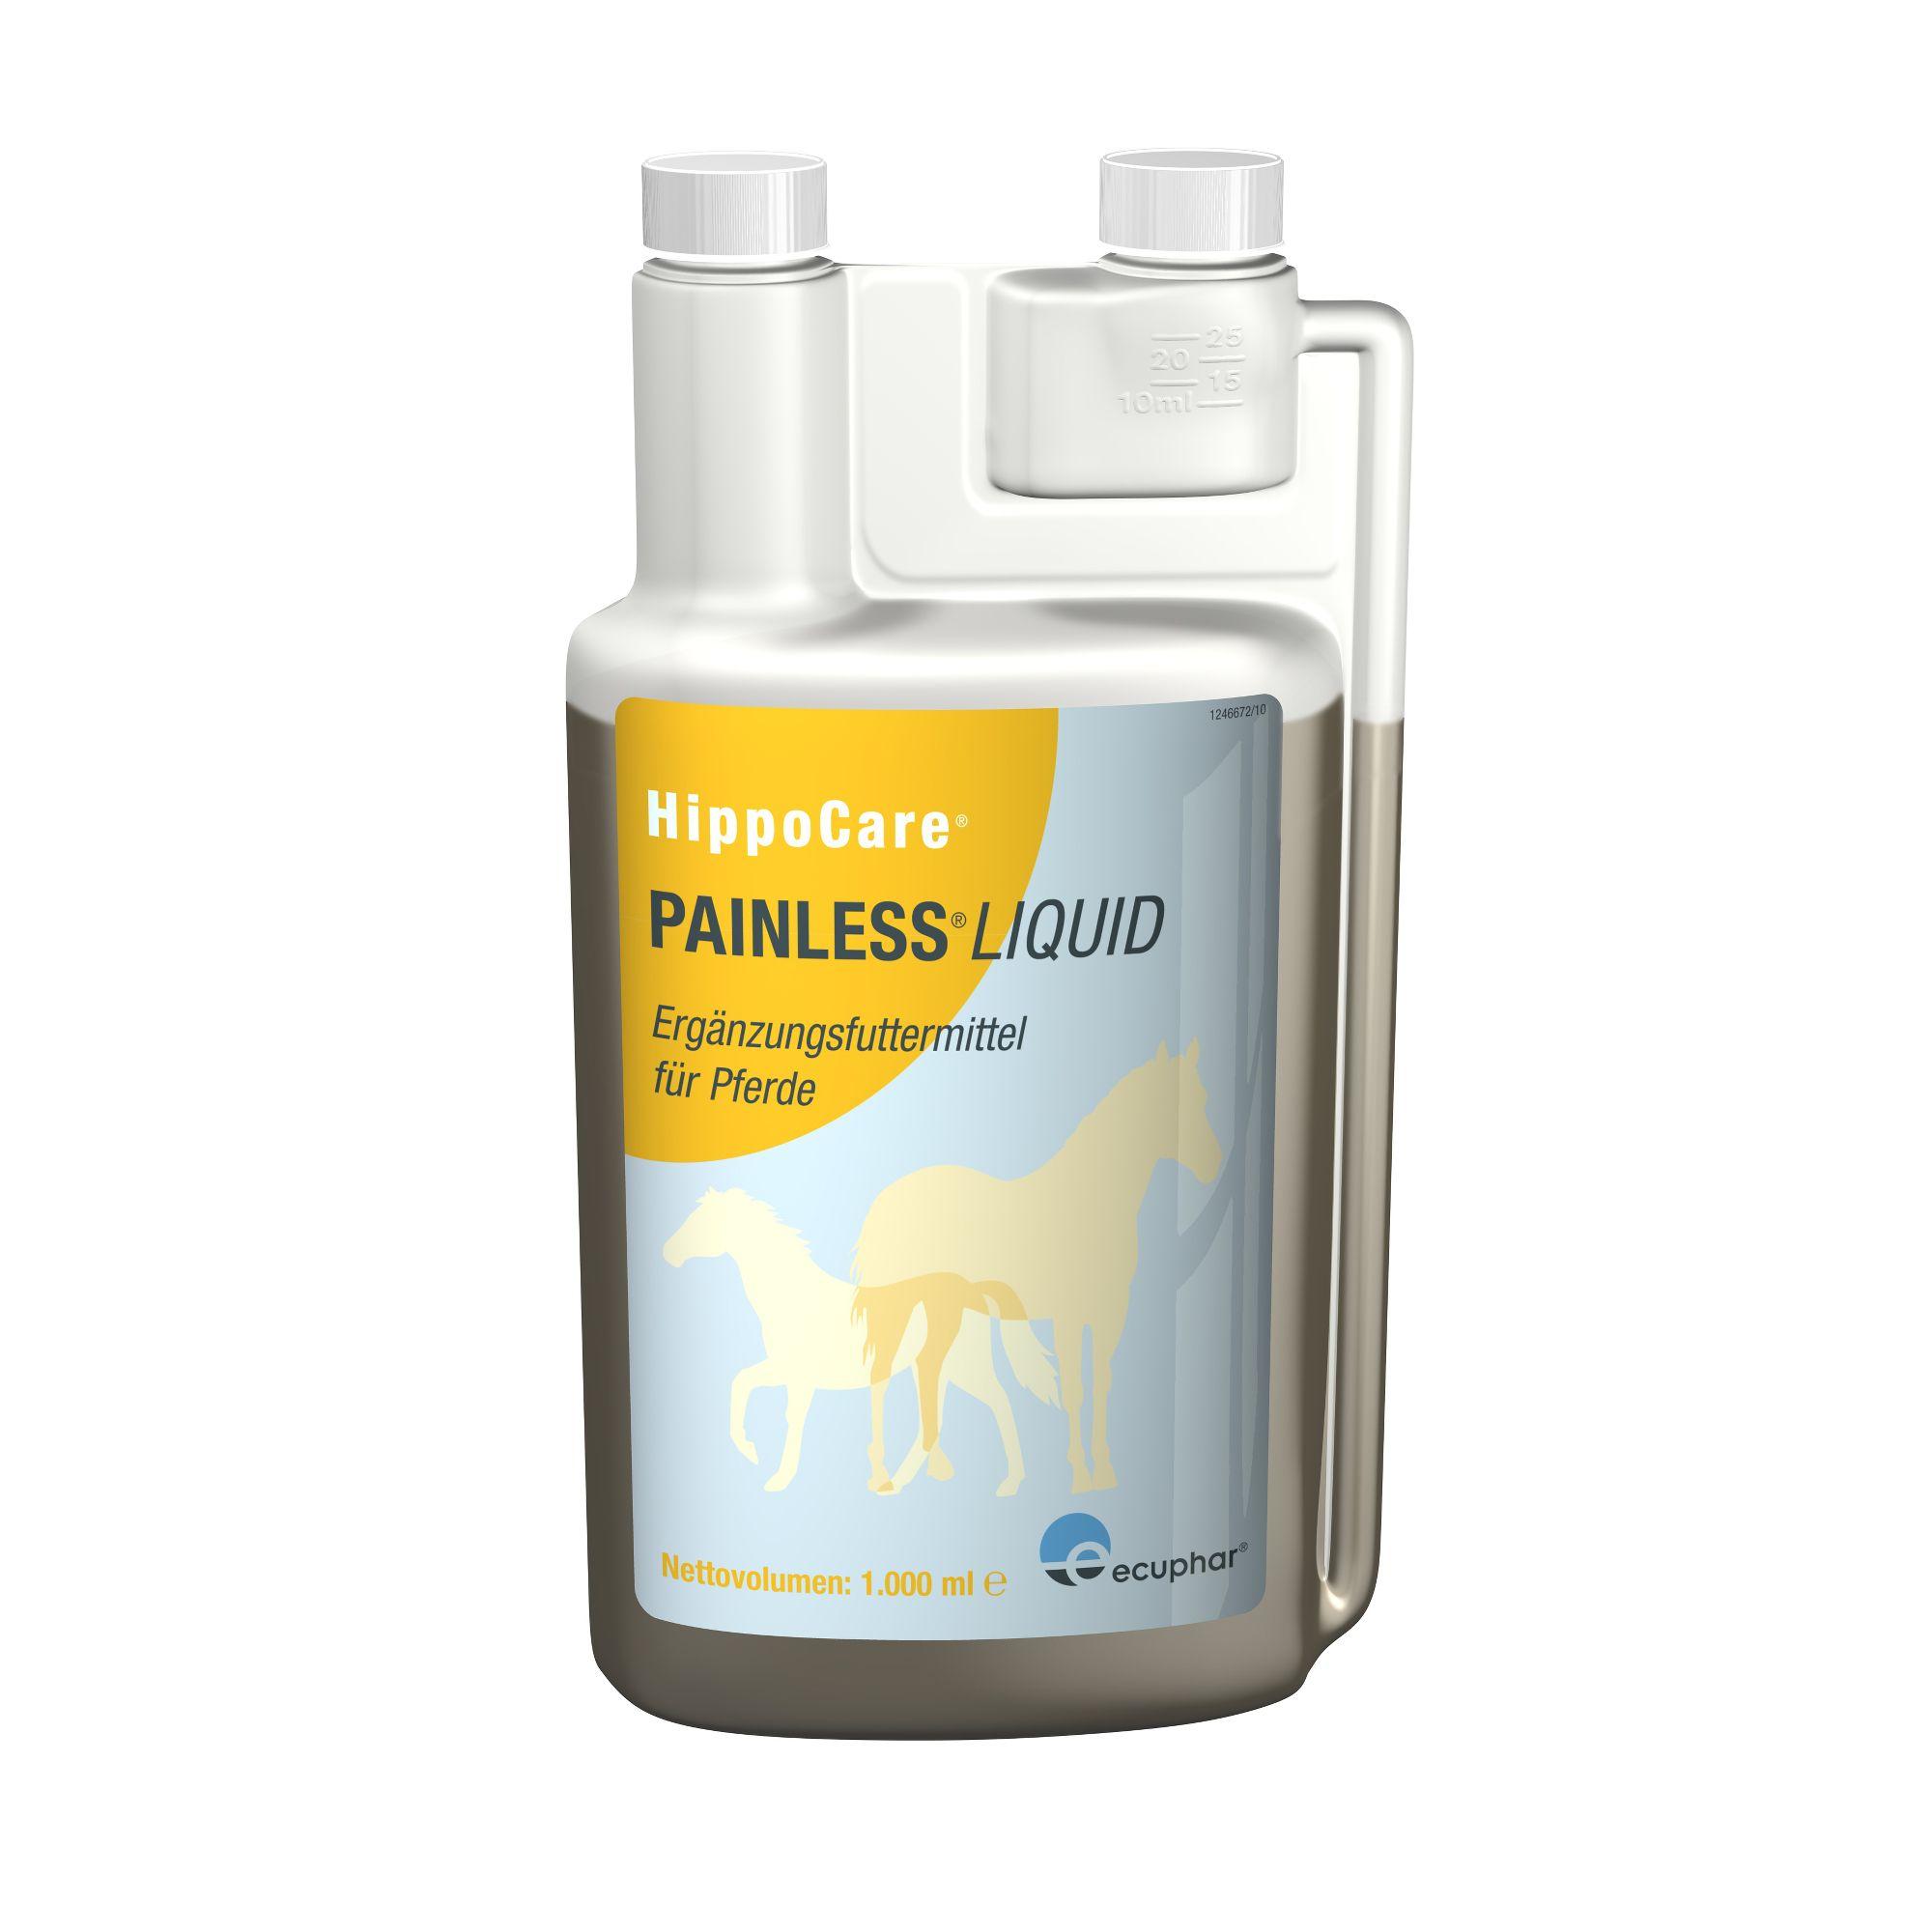 ecuphar HippoCare Painless liquid 1000 ml